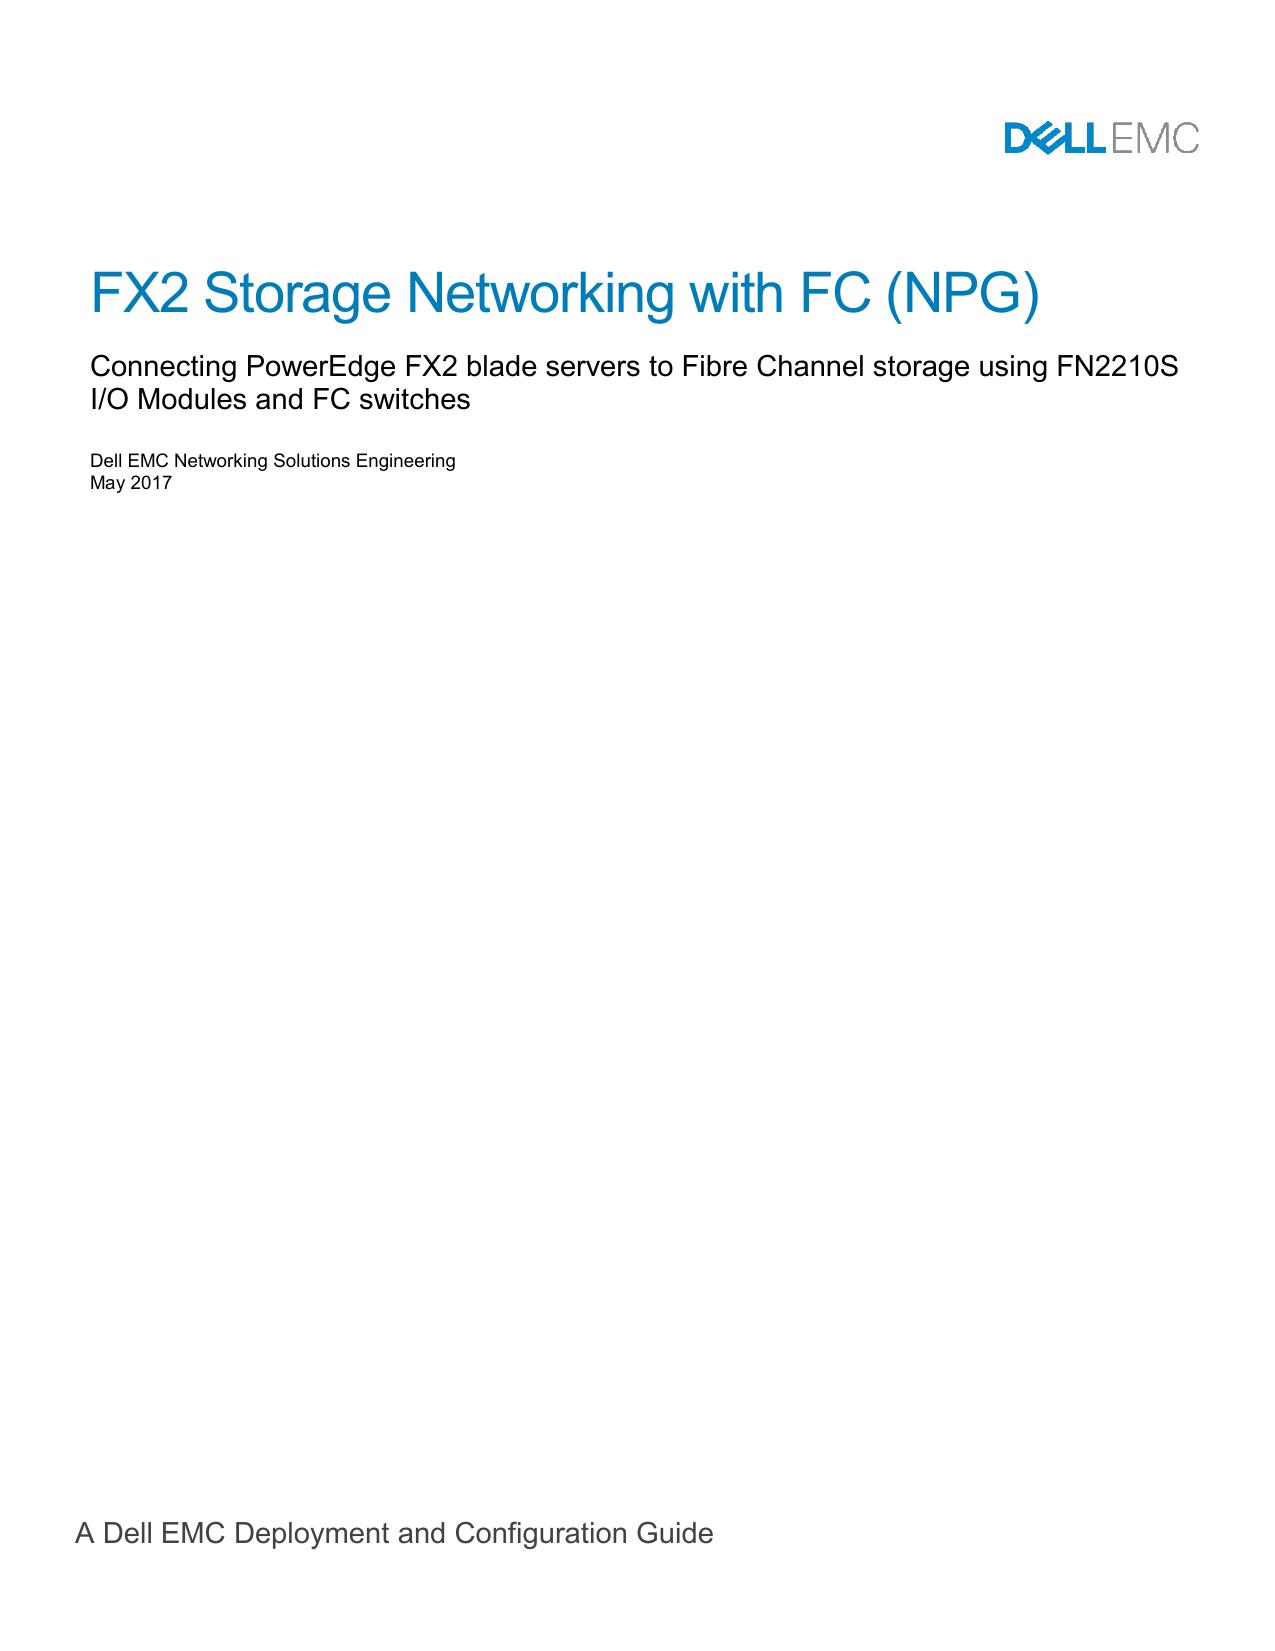 FX2 Storage Networking with FC (NPG) | manualzz com